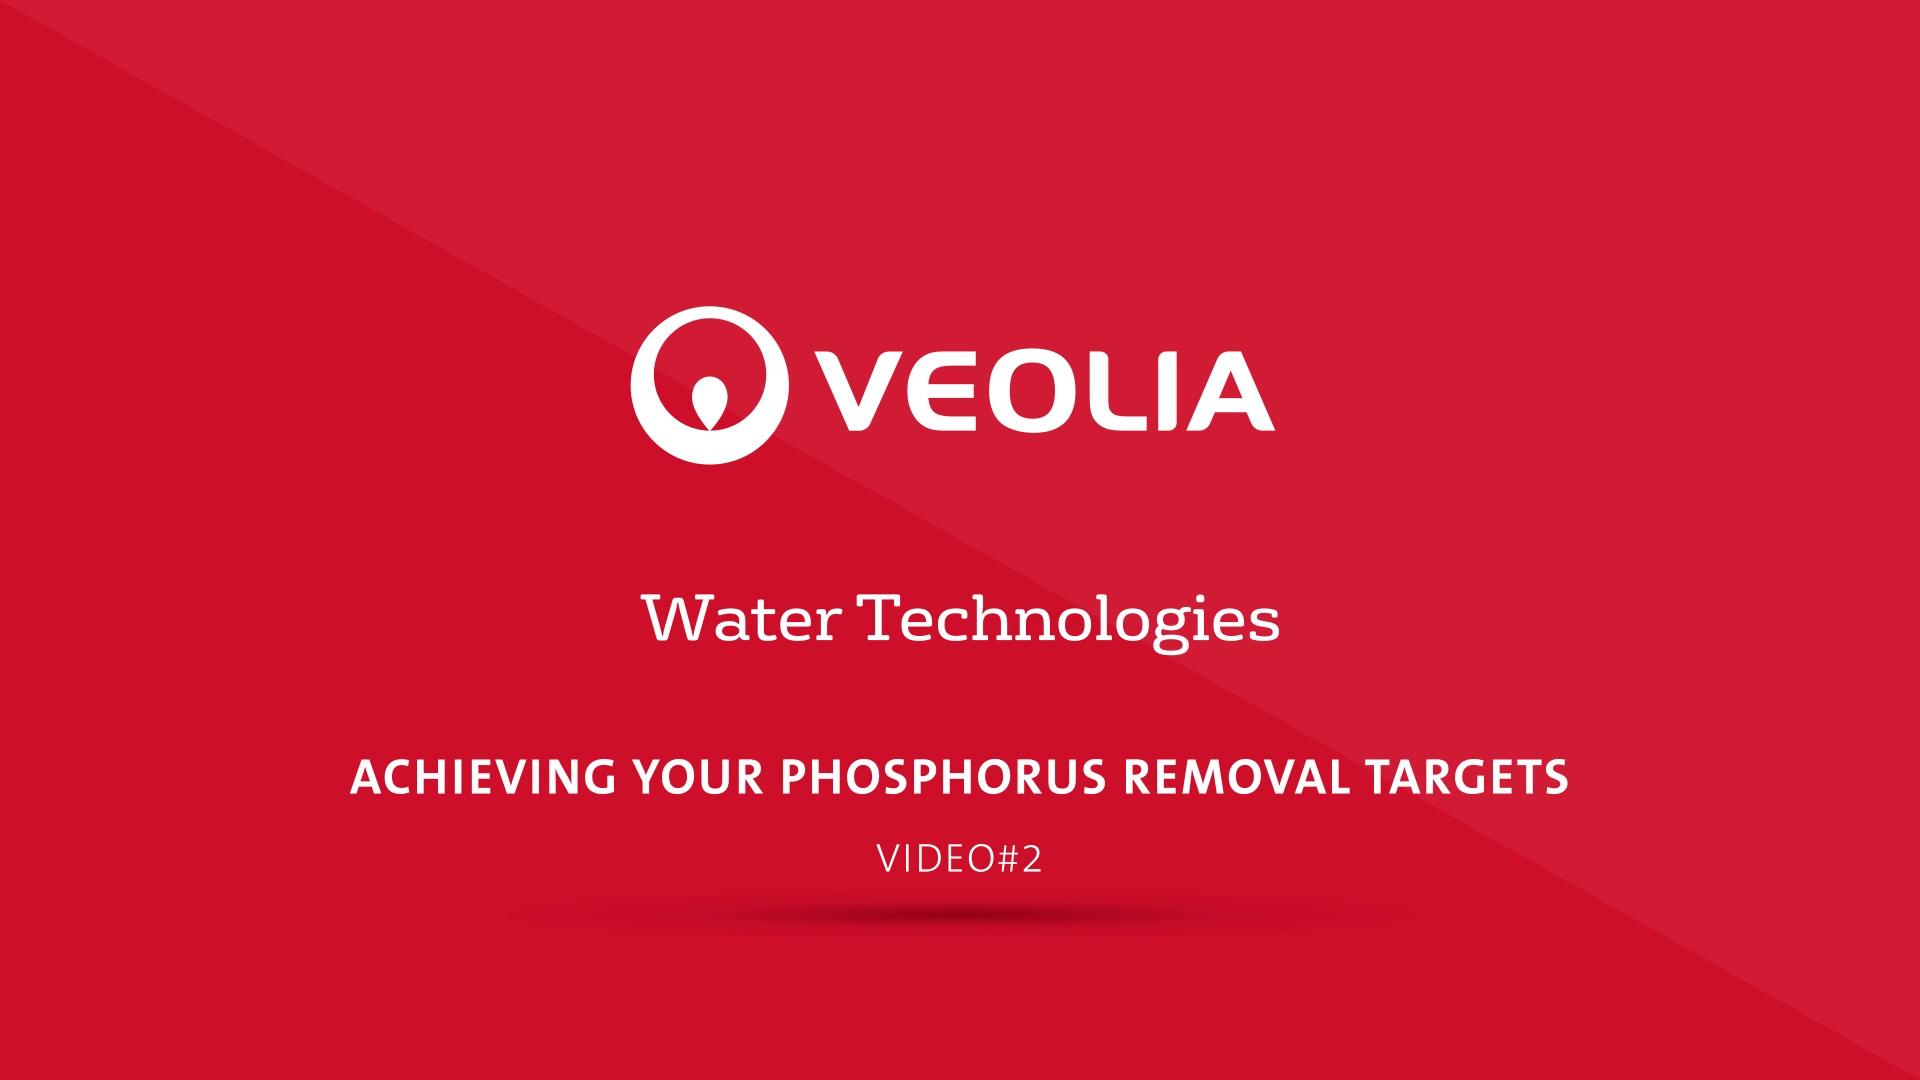 VEO_Phosphorus_Video_2_v5_FINAL